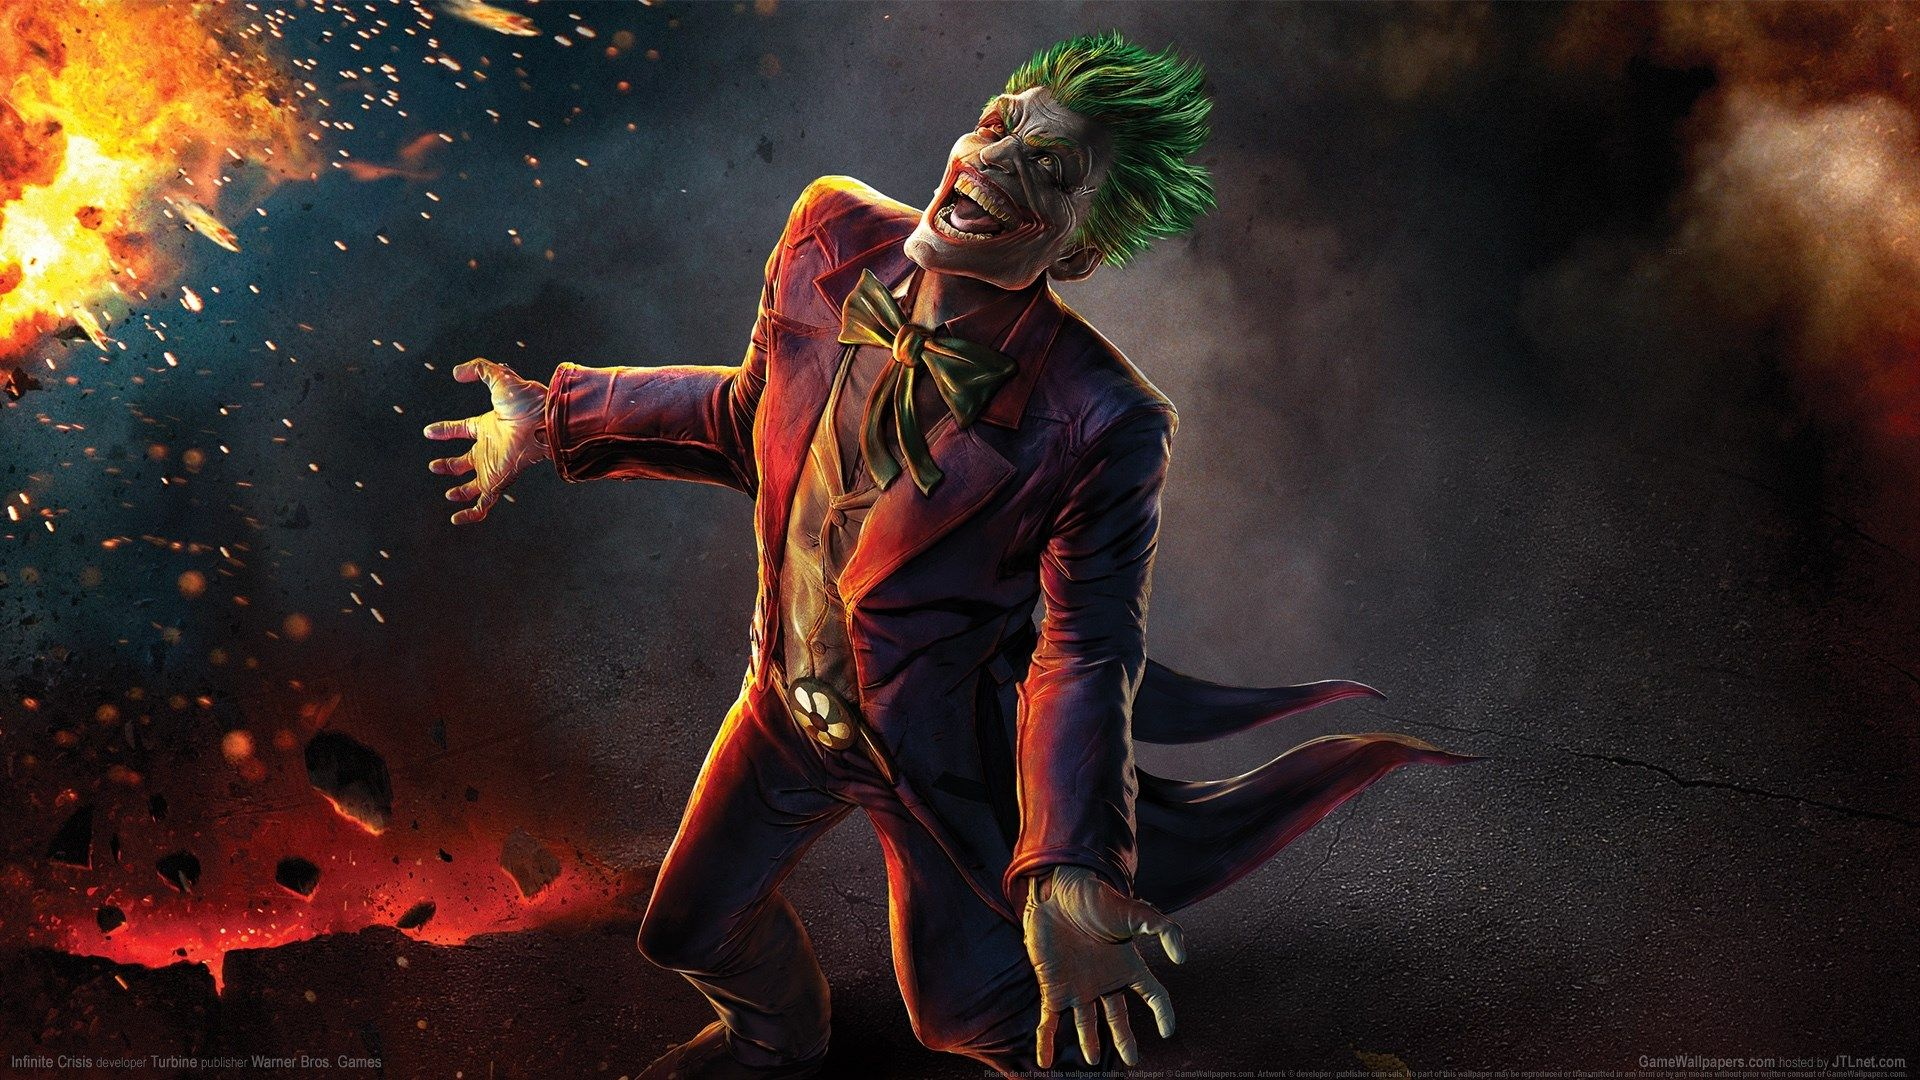 Infinite Crisis Full Hd Background 1920x1080 Gaming Wallpapers Joker Images Joker Hd Wallpaper